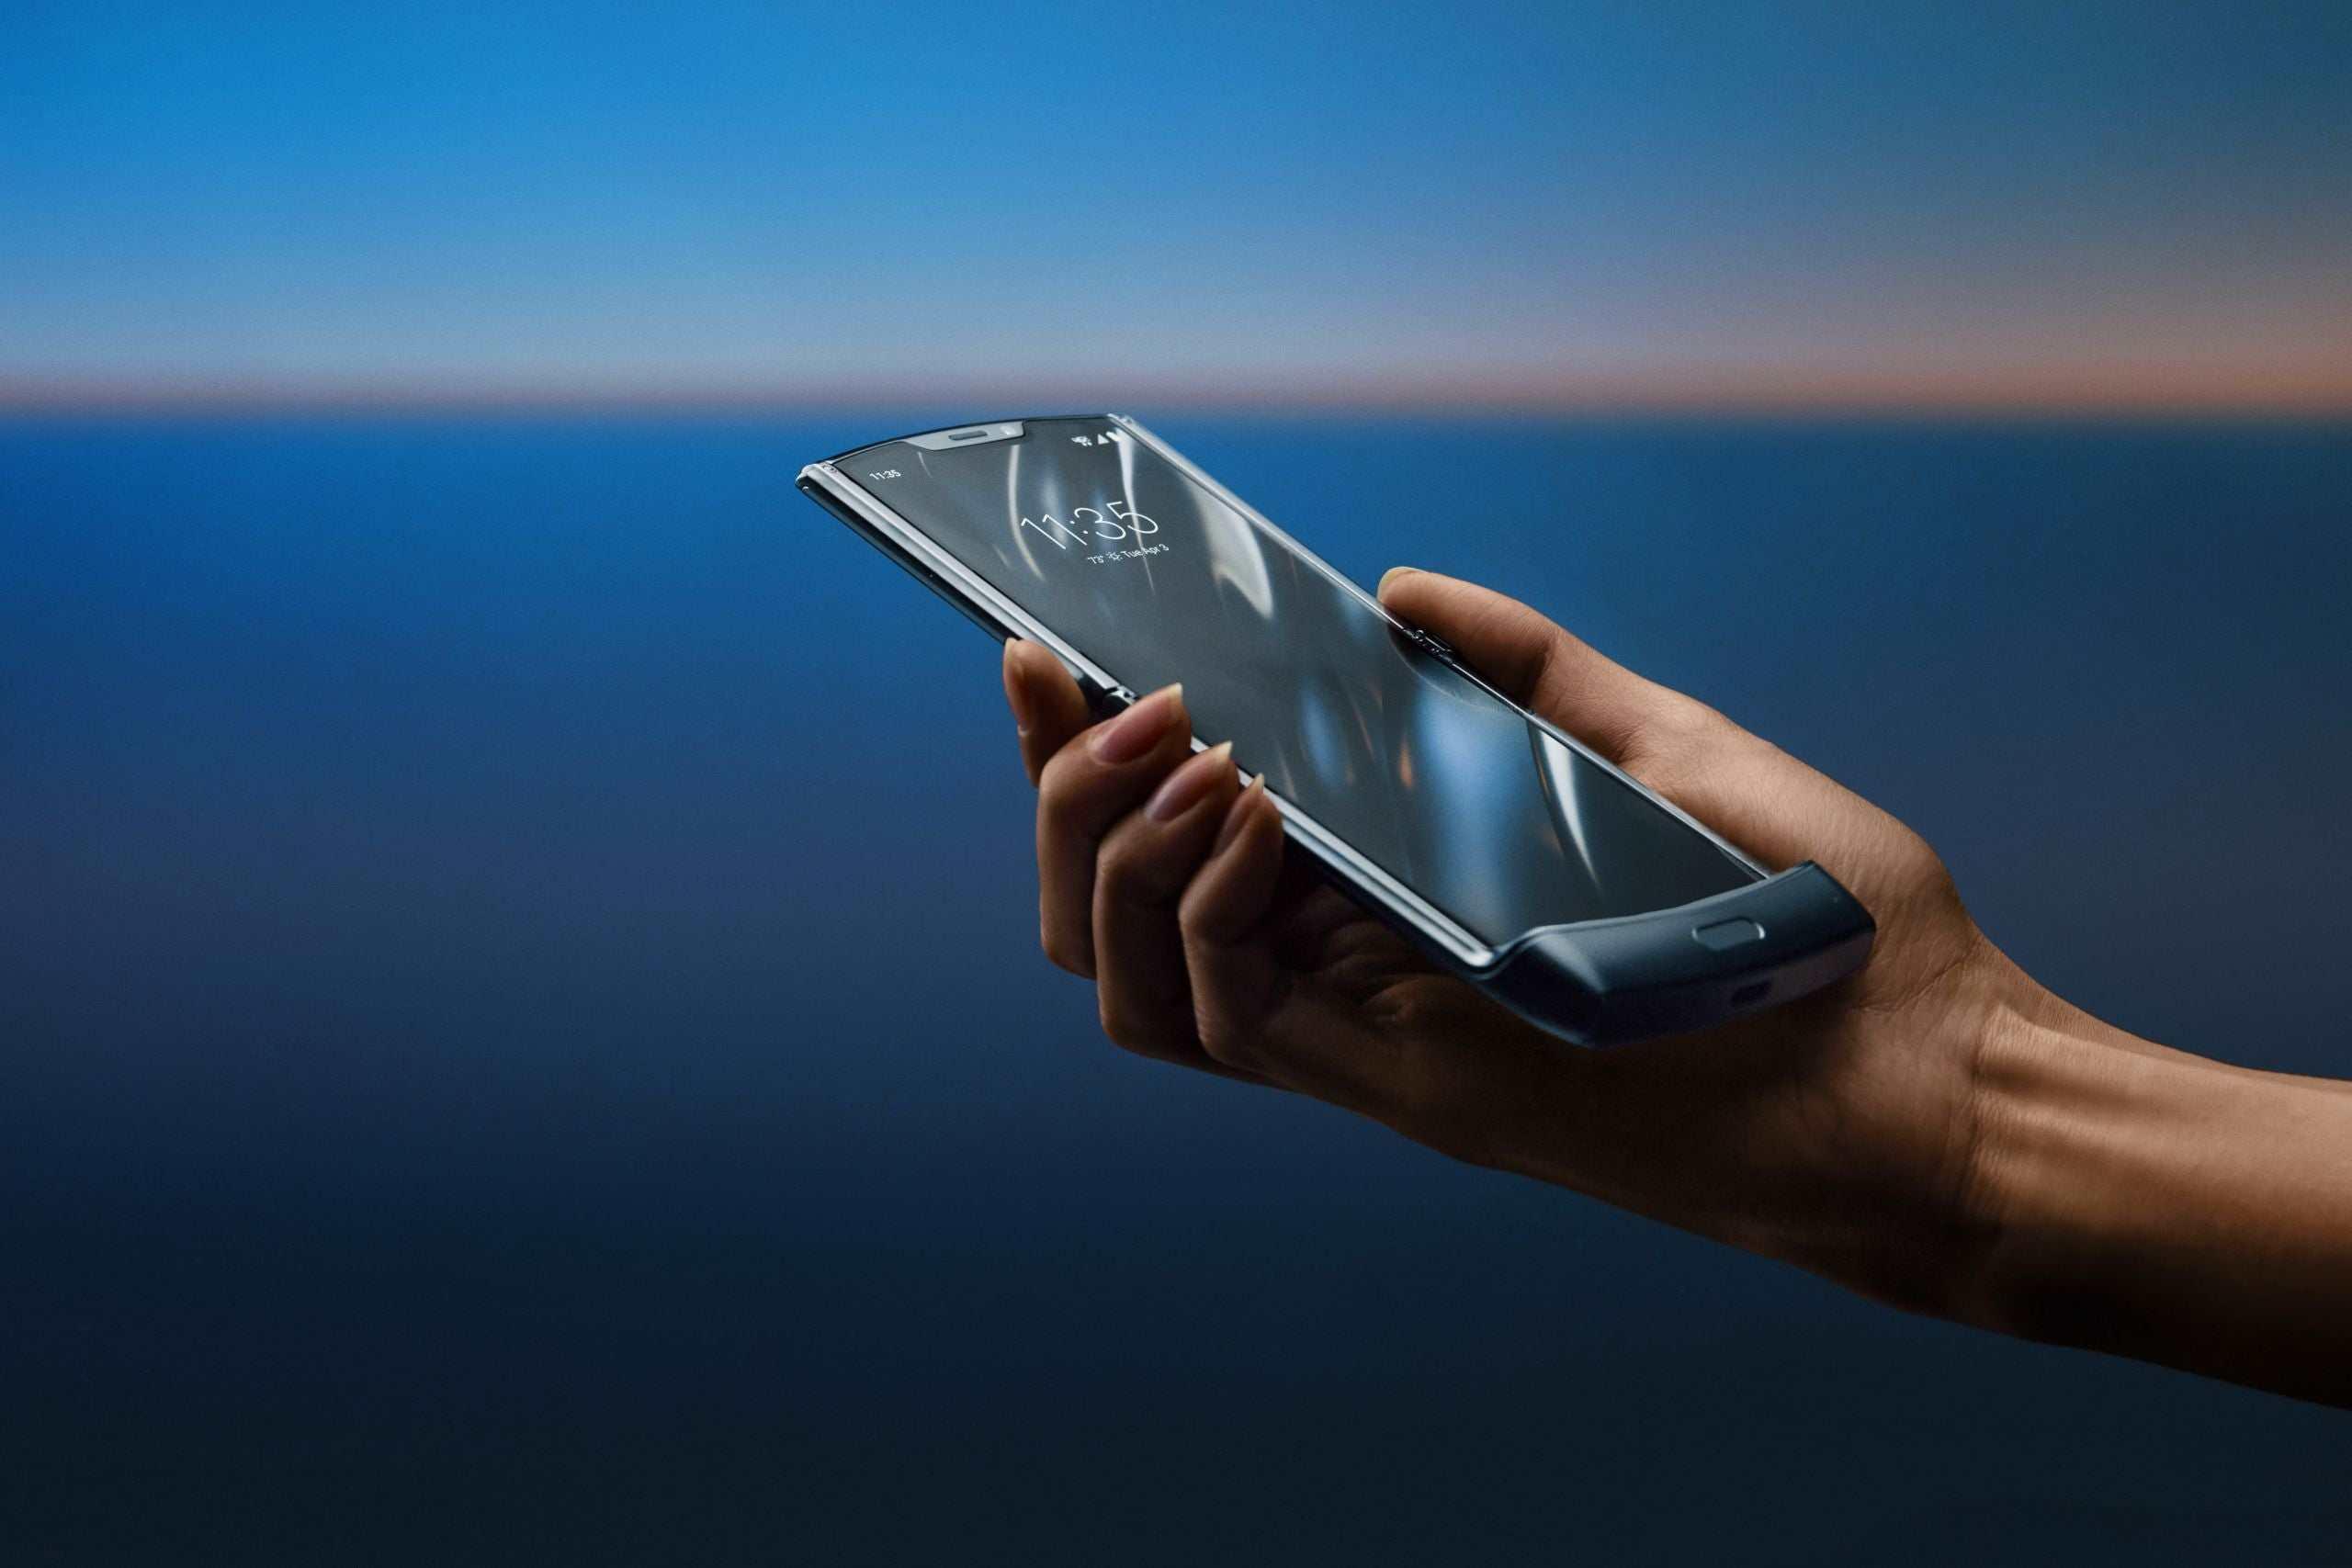 The Motorola Razr, a smartphone with a folding screen